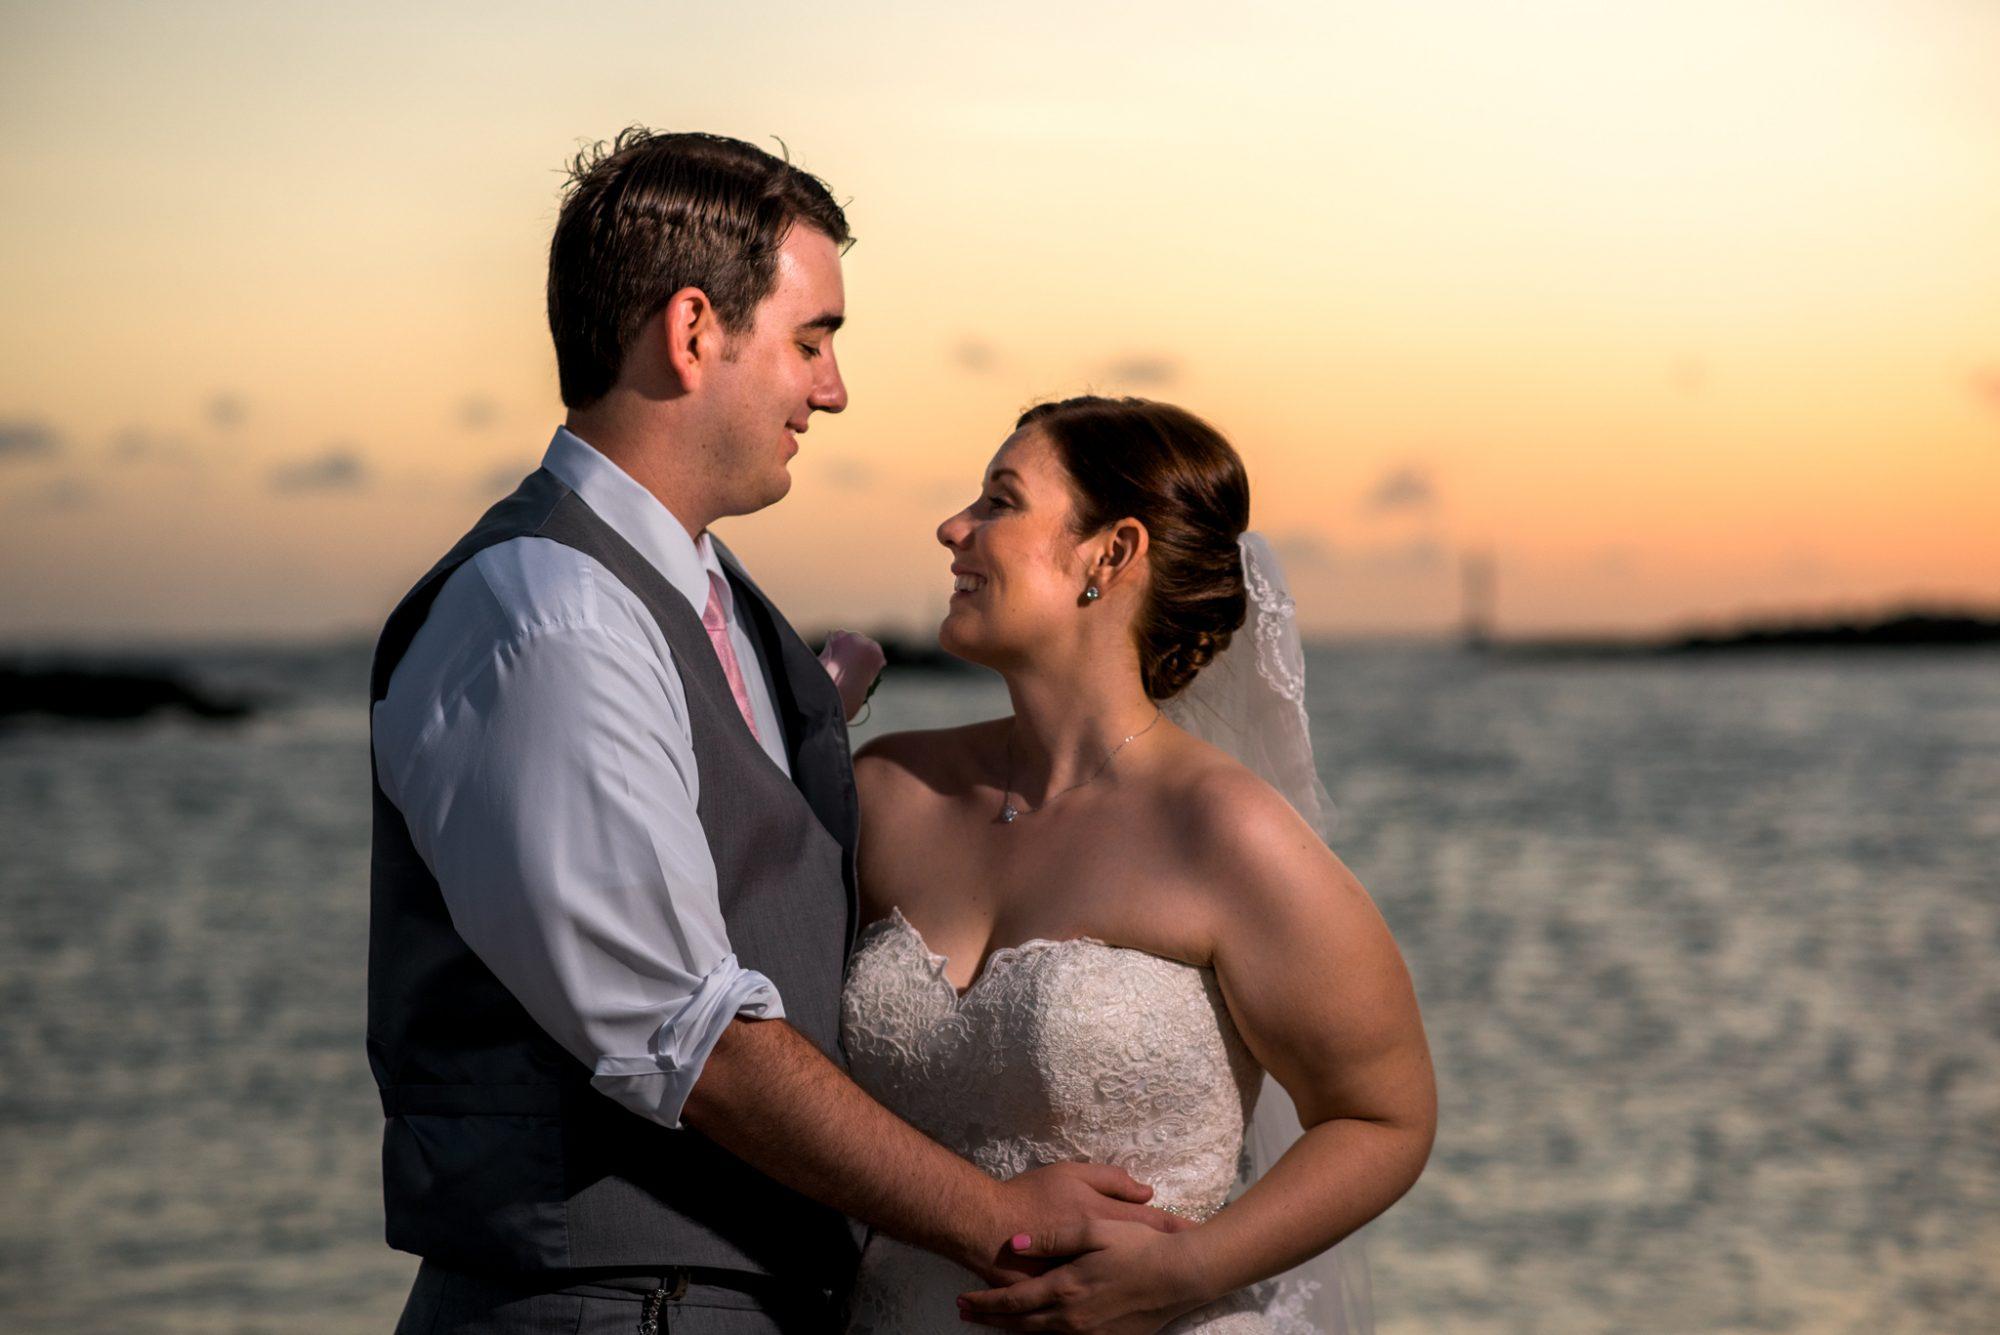 Heather Jeff Key West Wedding Photographer Fort Zachary Taylor 34 - Heather & Jeff - Key West Wedding Photographer - Fort Zachary Taylor